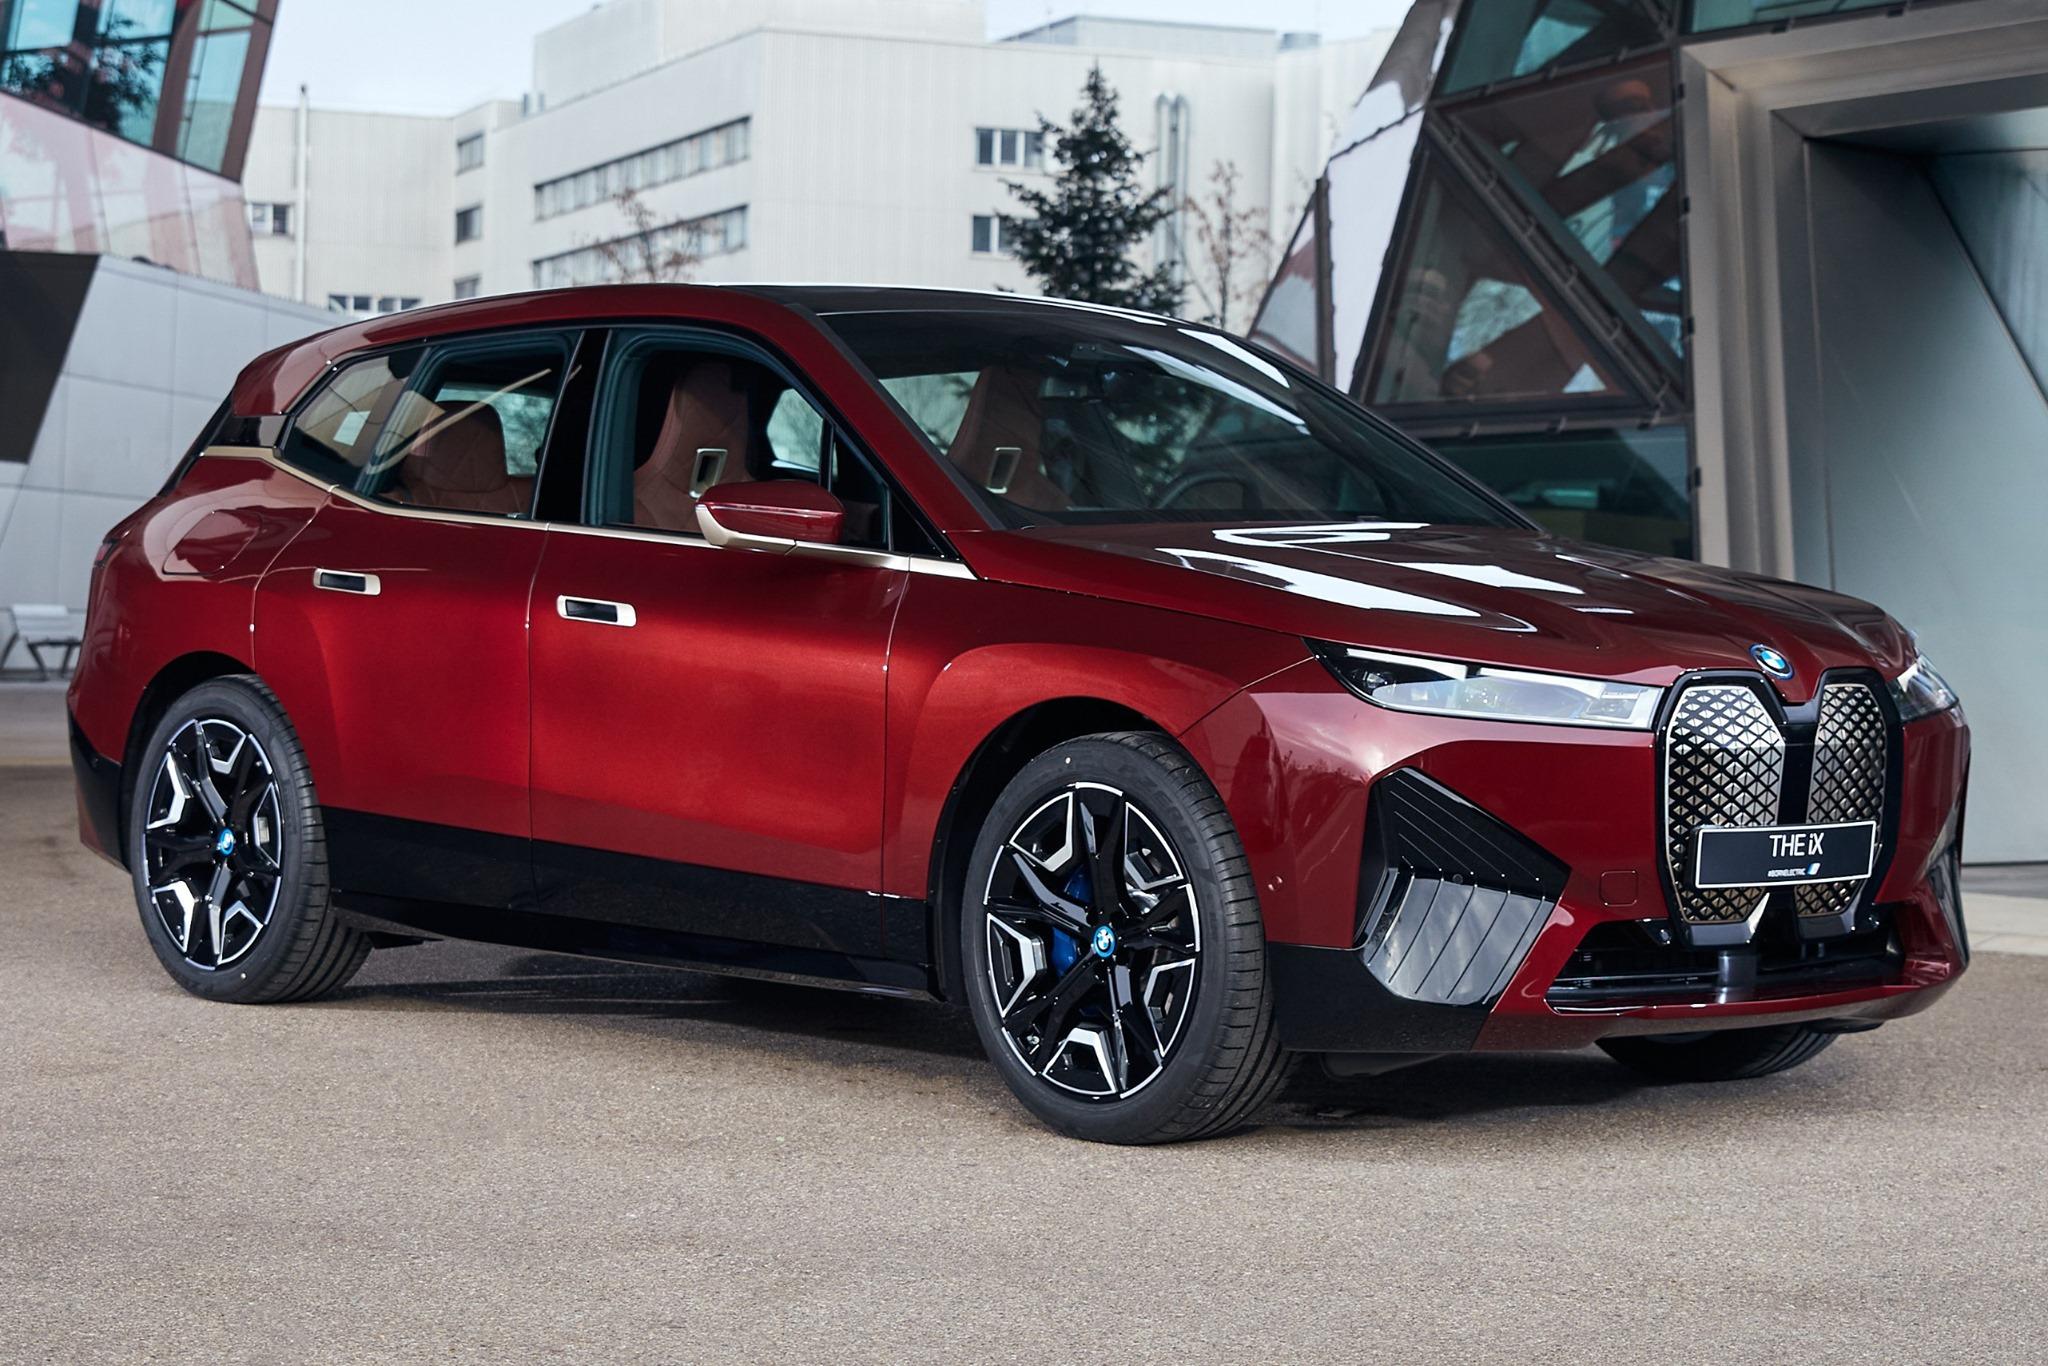 The new BMW iX at BMW Welt 5